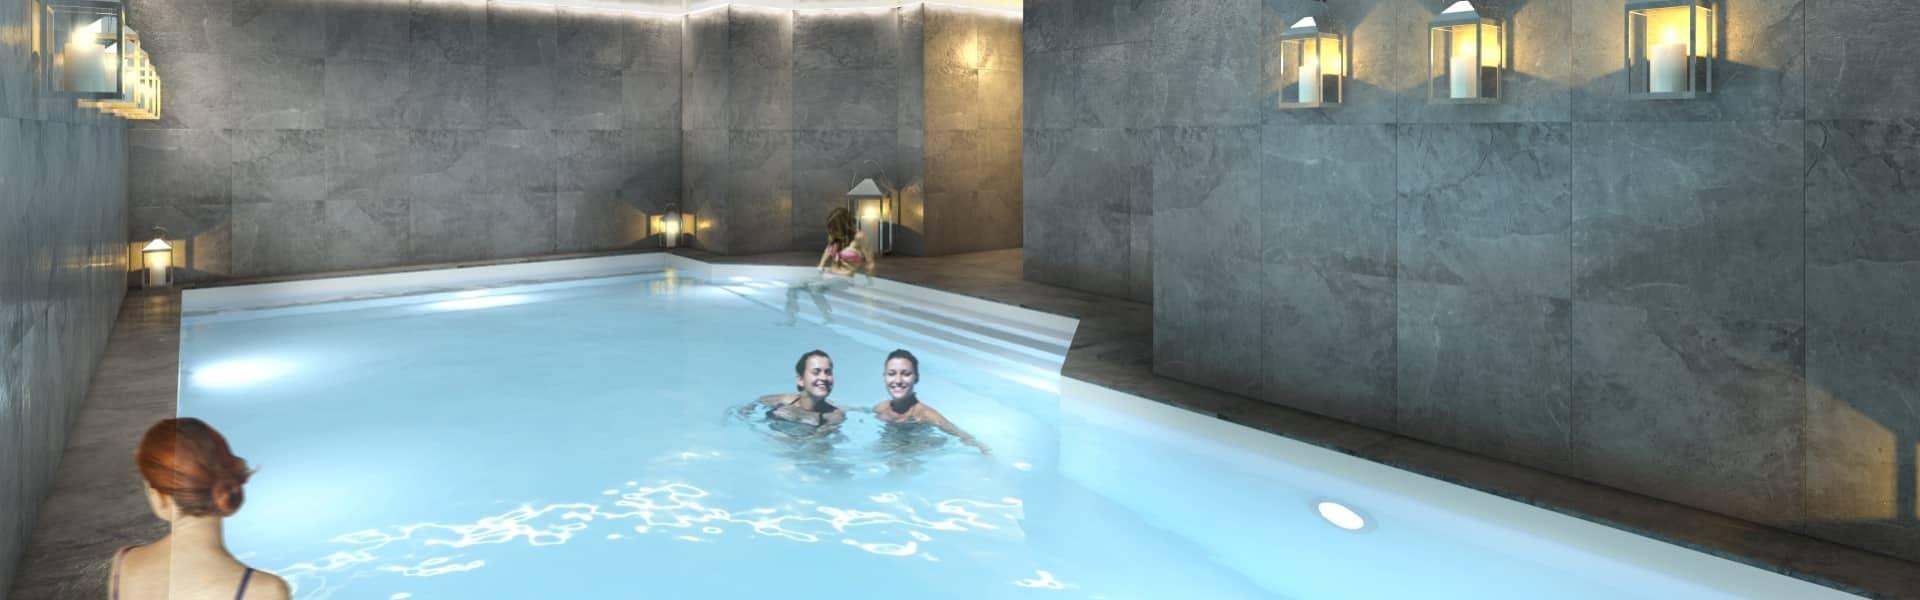 HOTEL-ARAUCARIA-SPA-SWIMMING-POOL